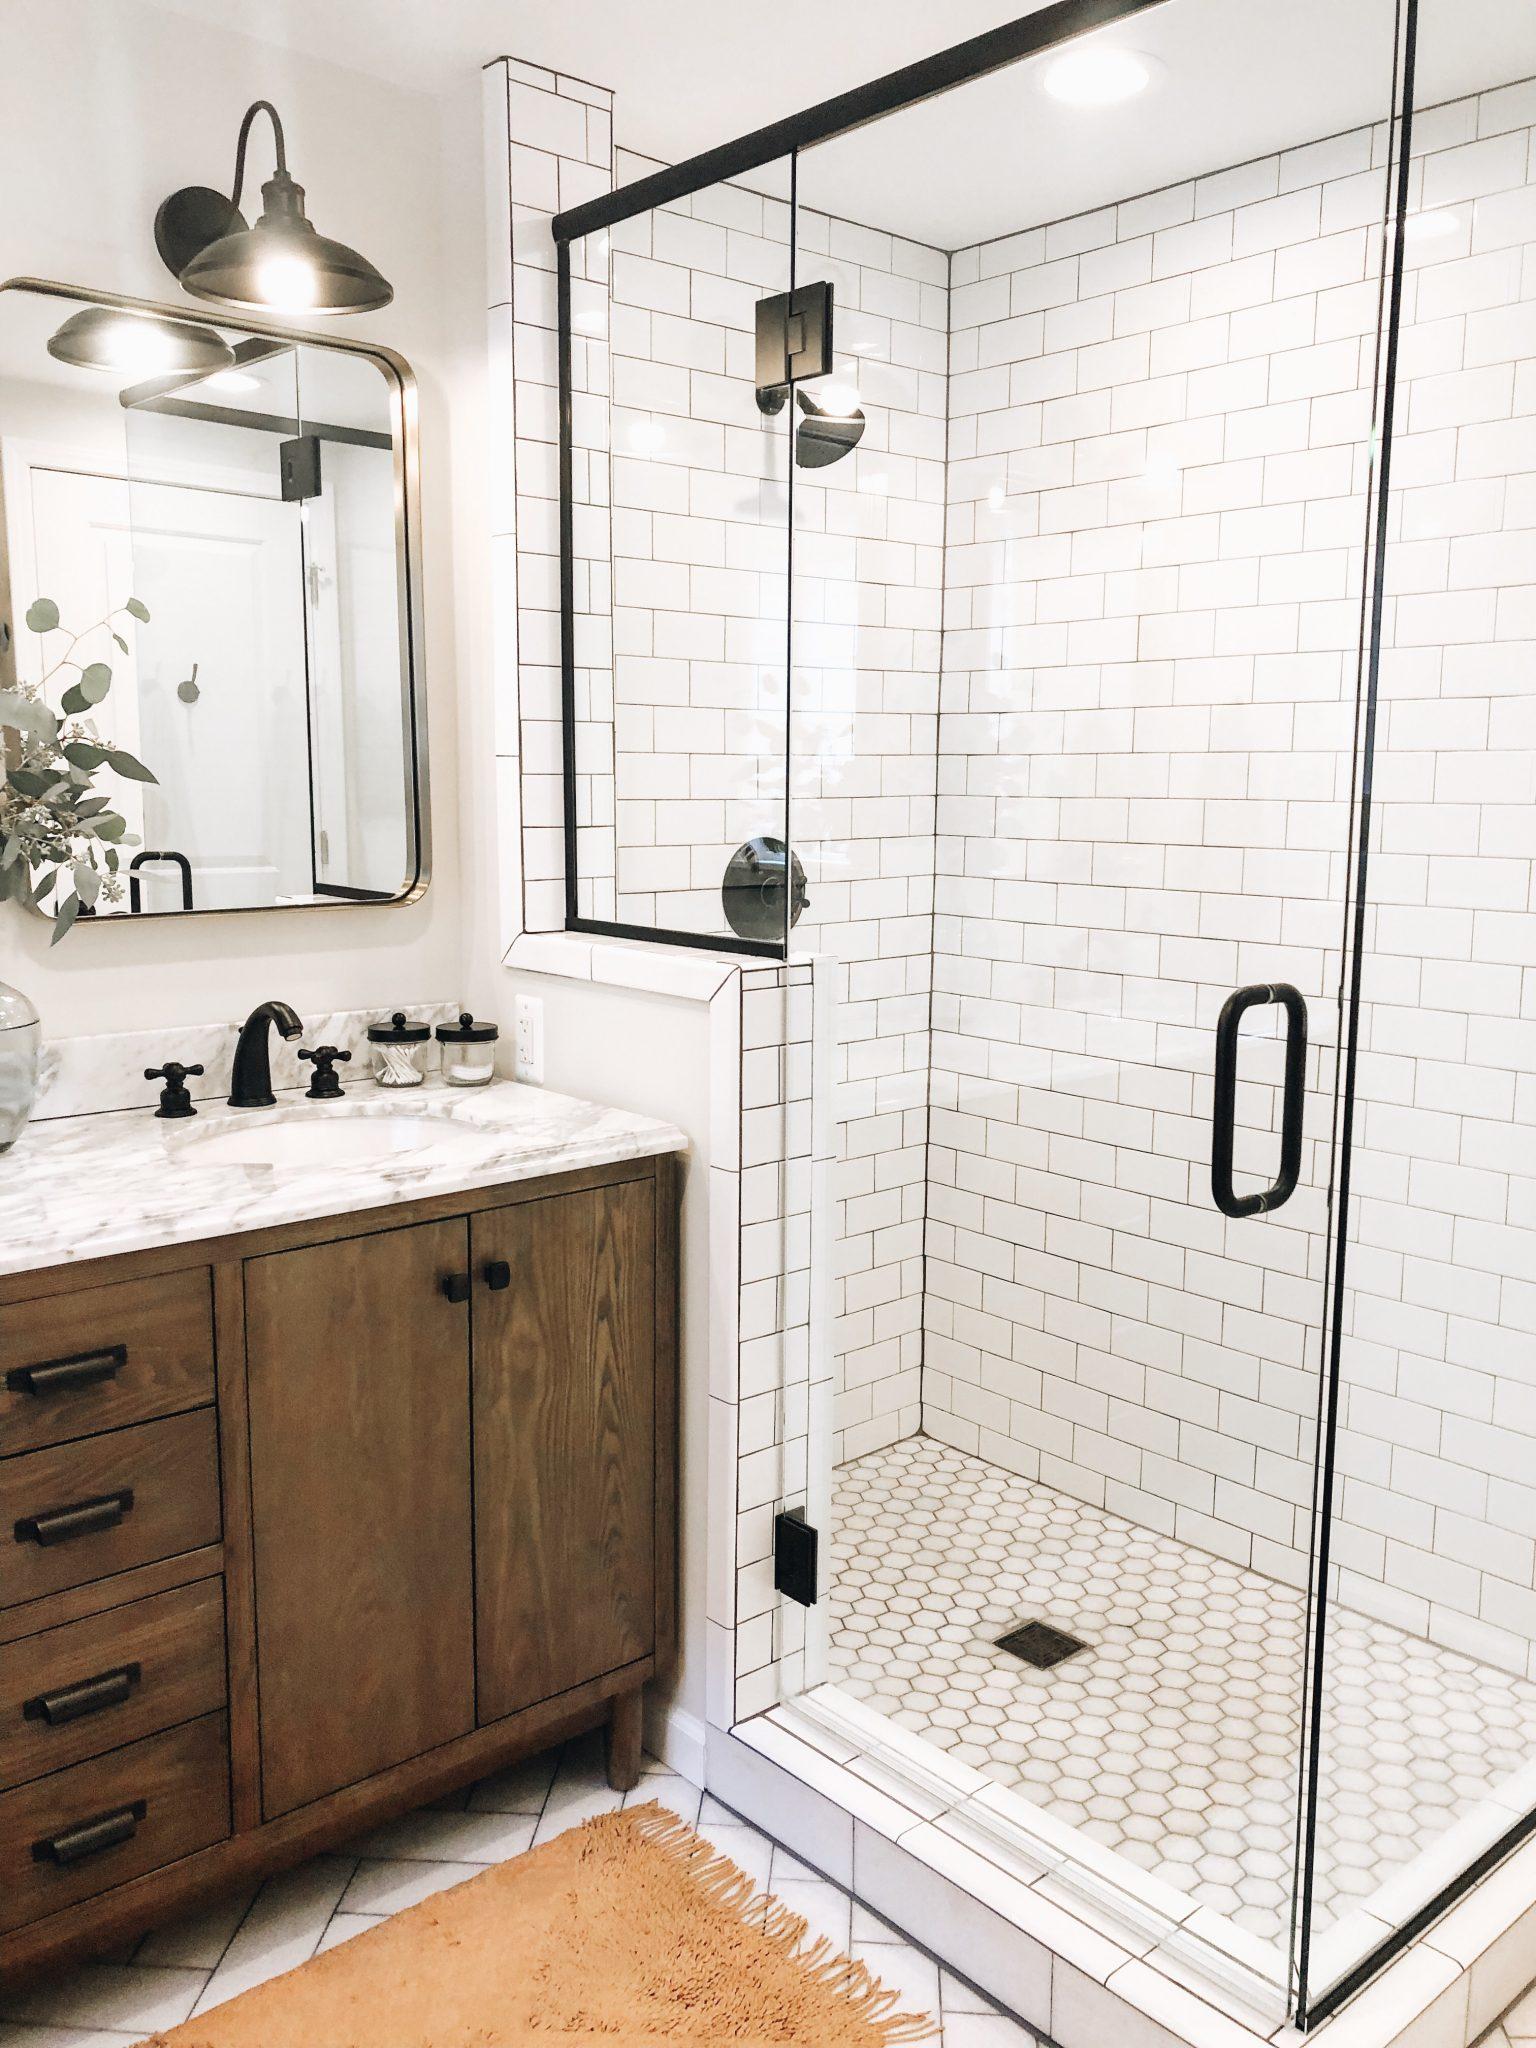 Master Bathroom Reveal | Daily Splendor Life and Style Blog | master bathroom #modernfarmhouse #modernfarmhousebathroom #Fixerupperstyle #contemporarybathroom #marbletile #subwaytile #subwaytileshower #herringbonetilefloor #matteblackbathroomfixtures